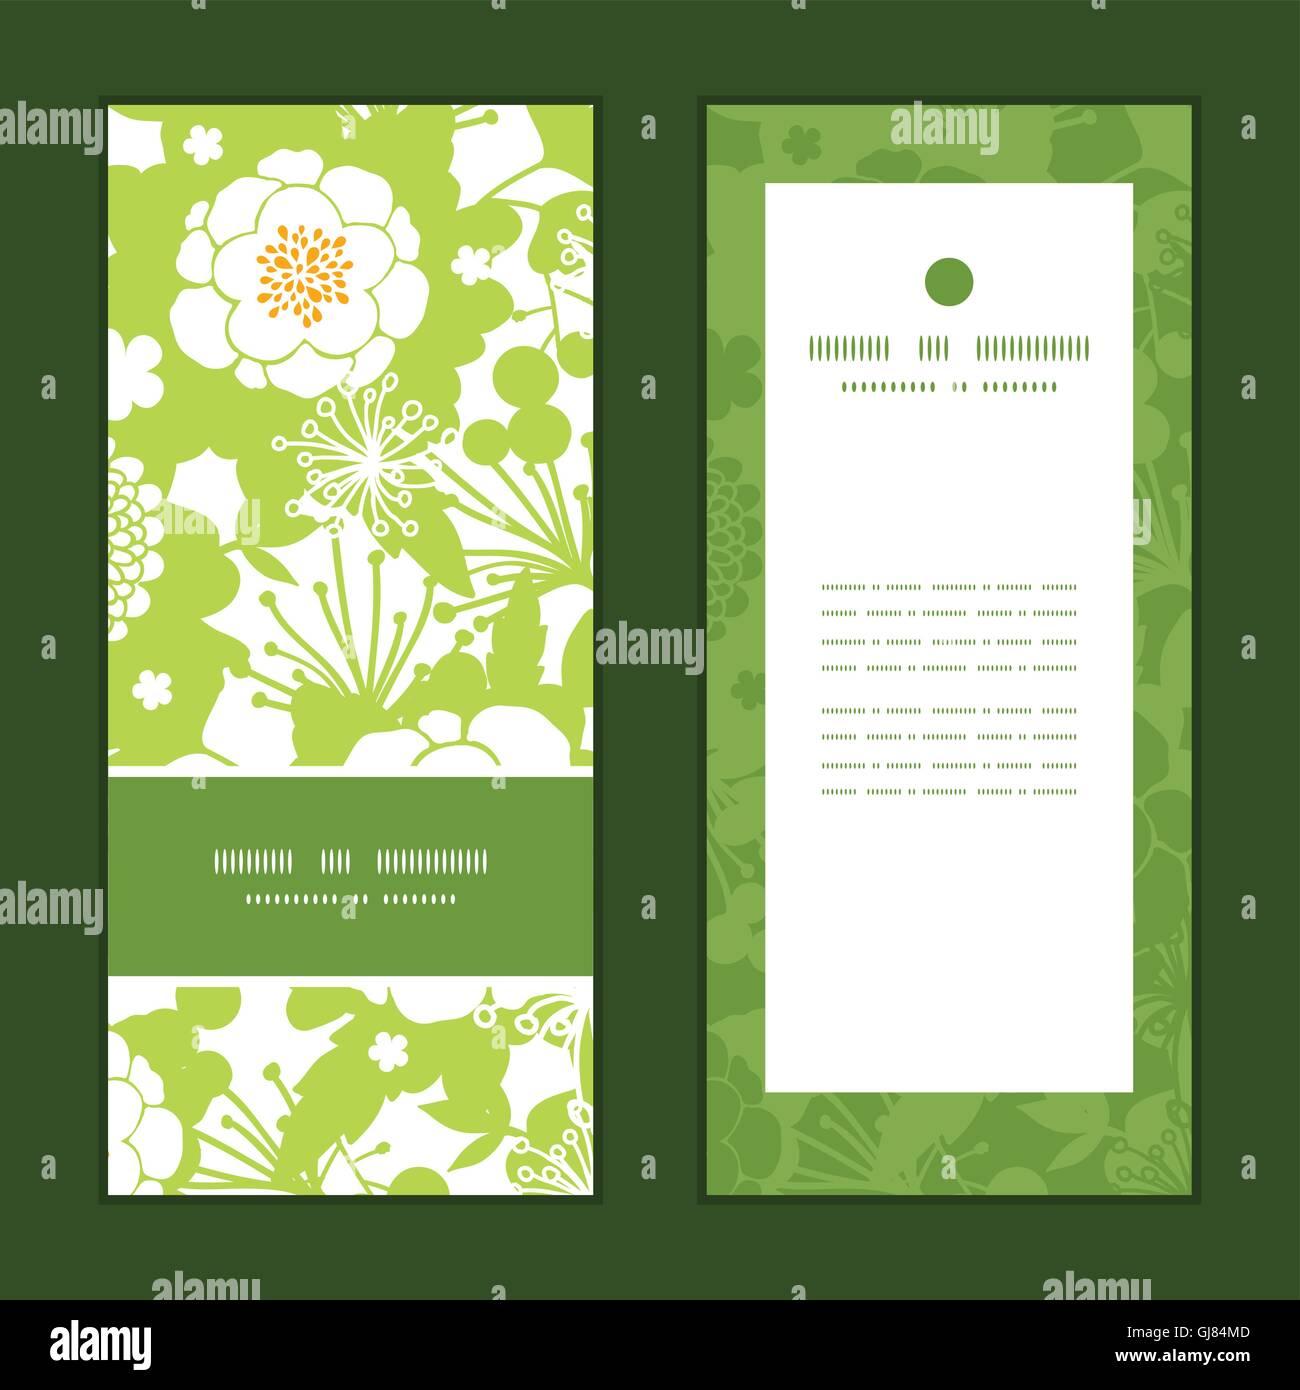 Vector Green And Golden Garden Silhouettes Vertical Frame Pattern